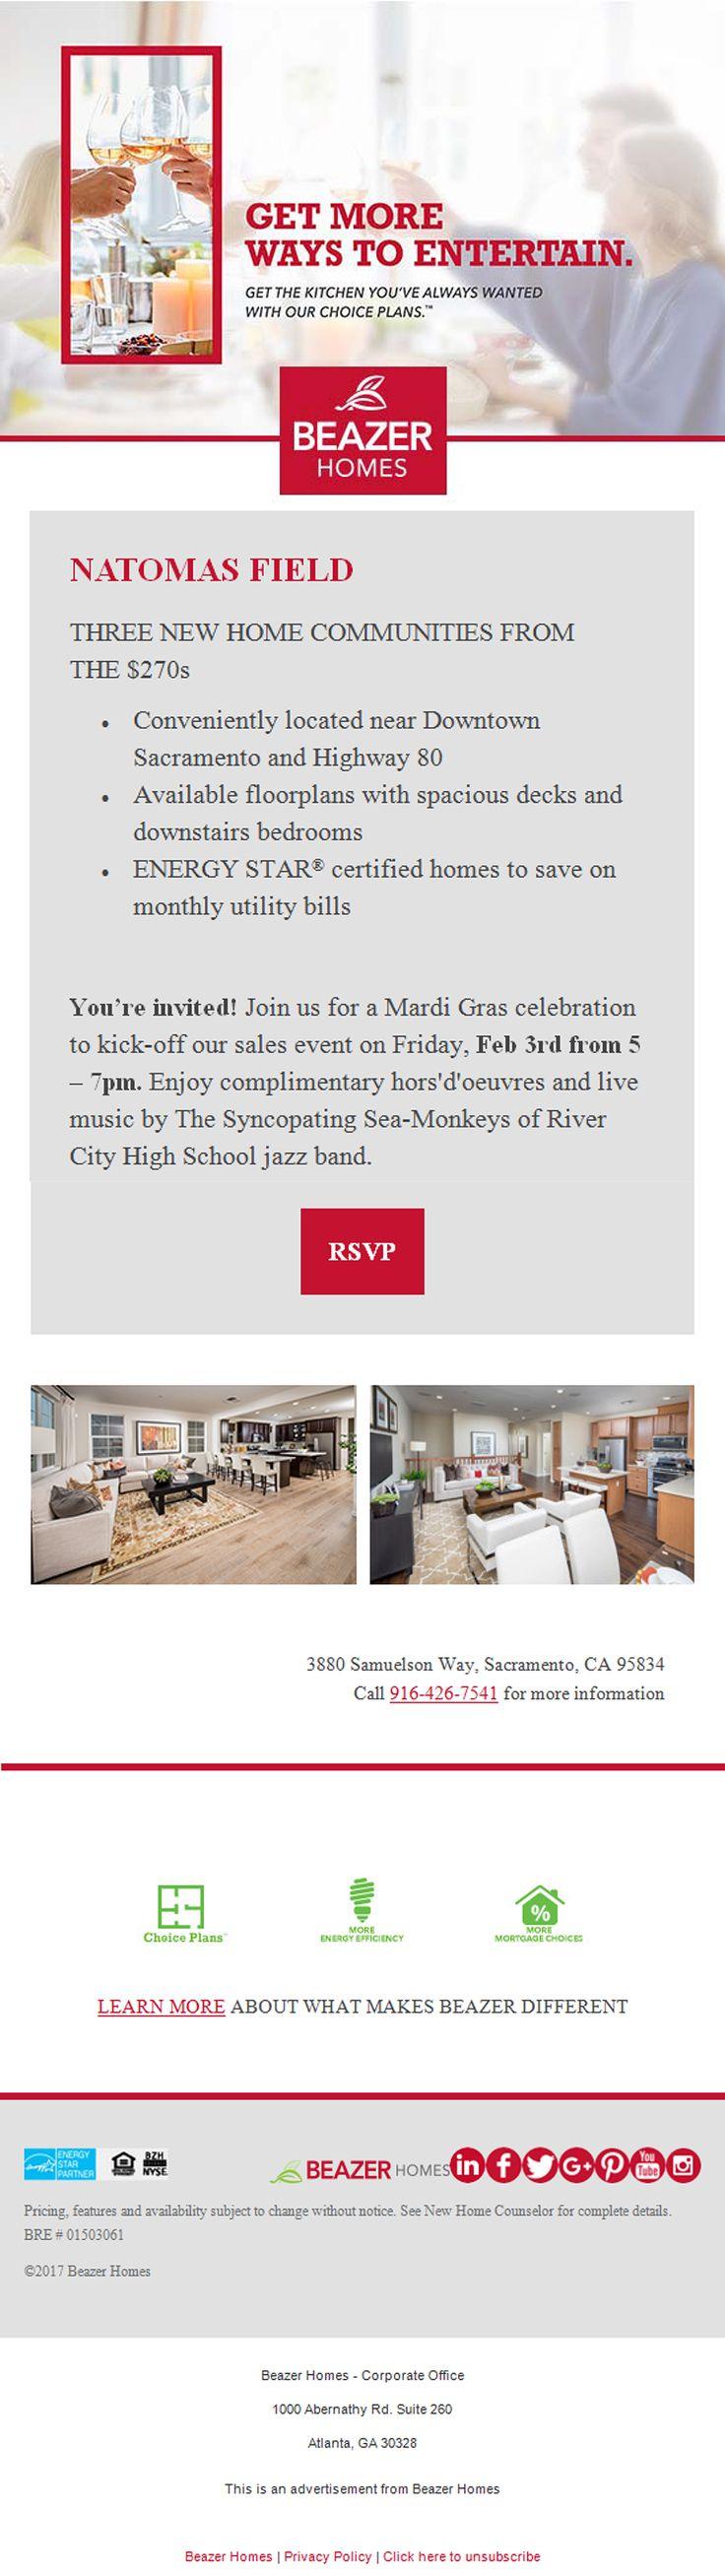 New Homes In Sacramento, California 2/3/17   Youu0027re Invited